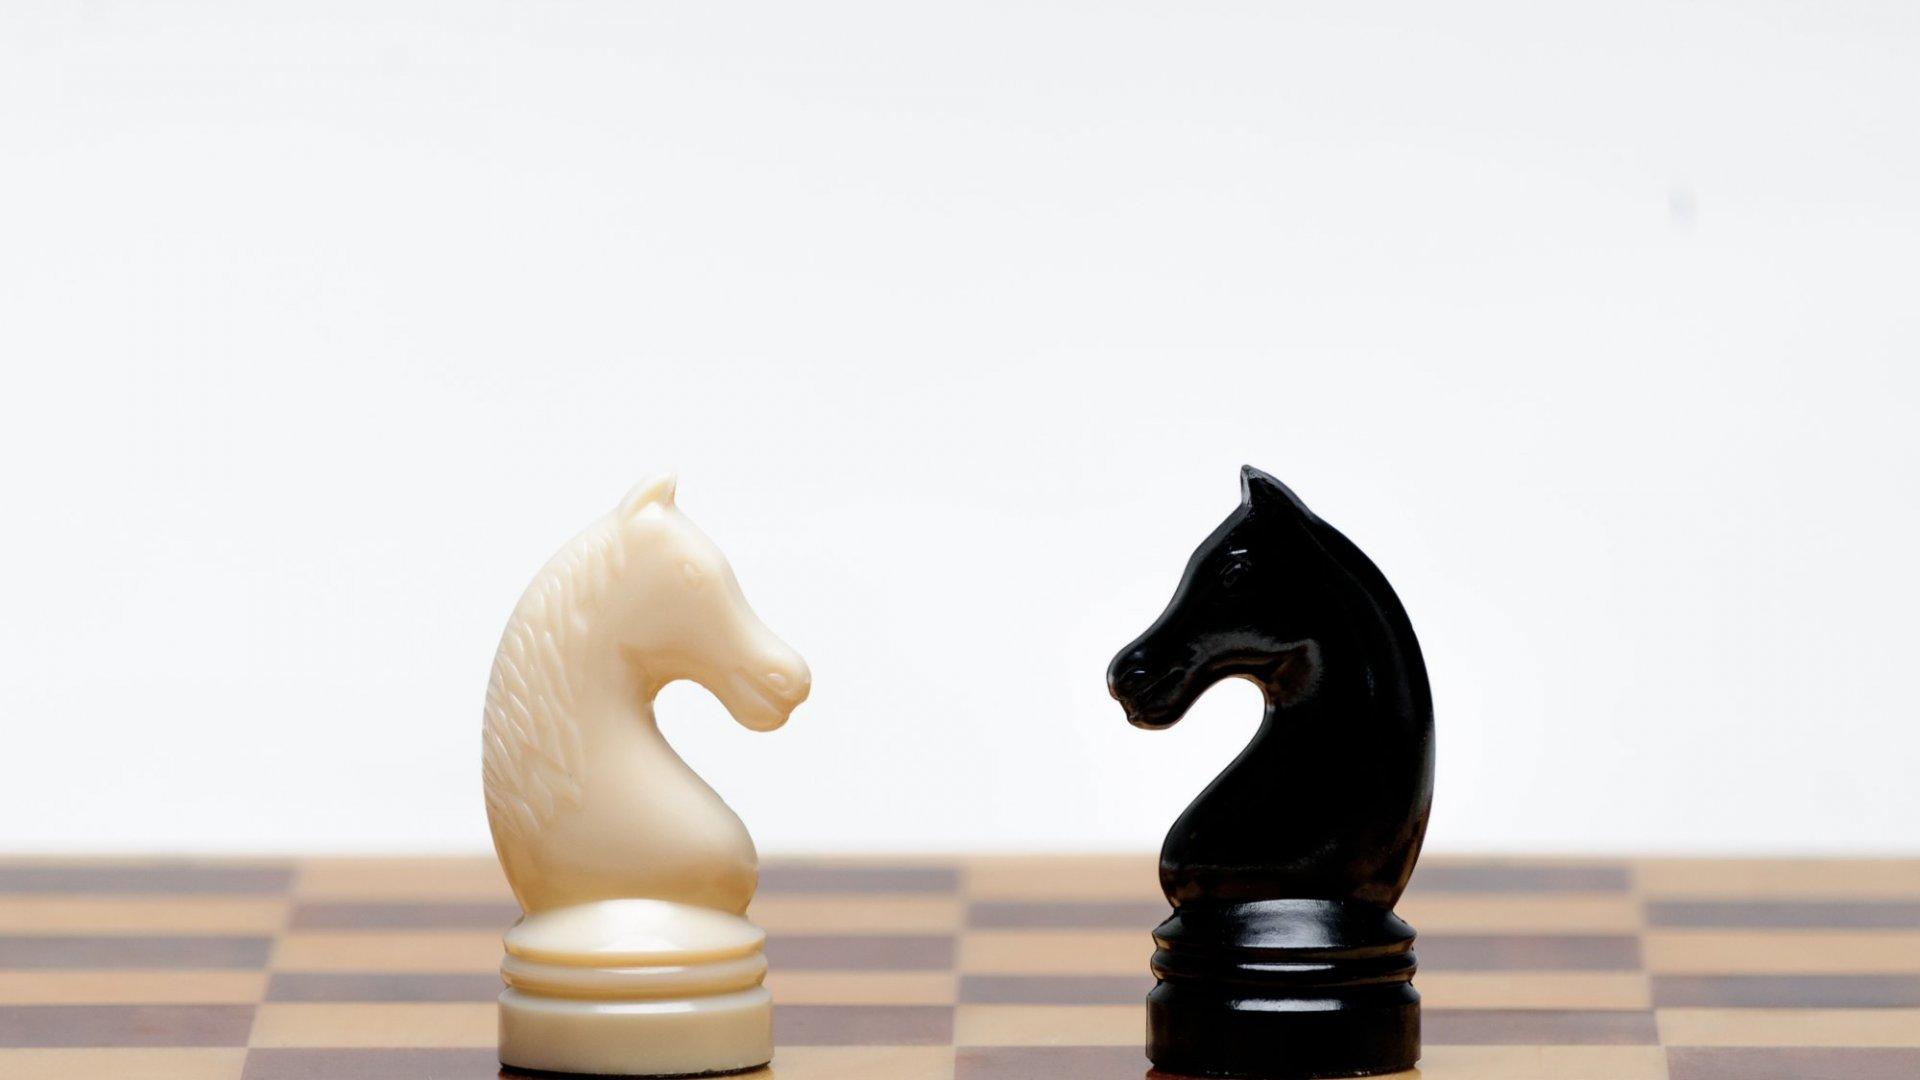 4 Easy Ways to De-Escalate Workplace Conflict